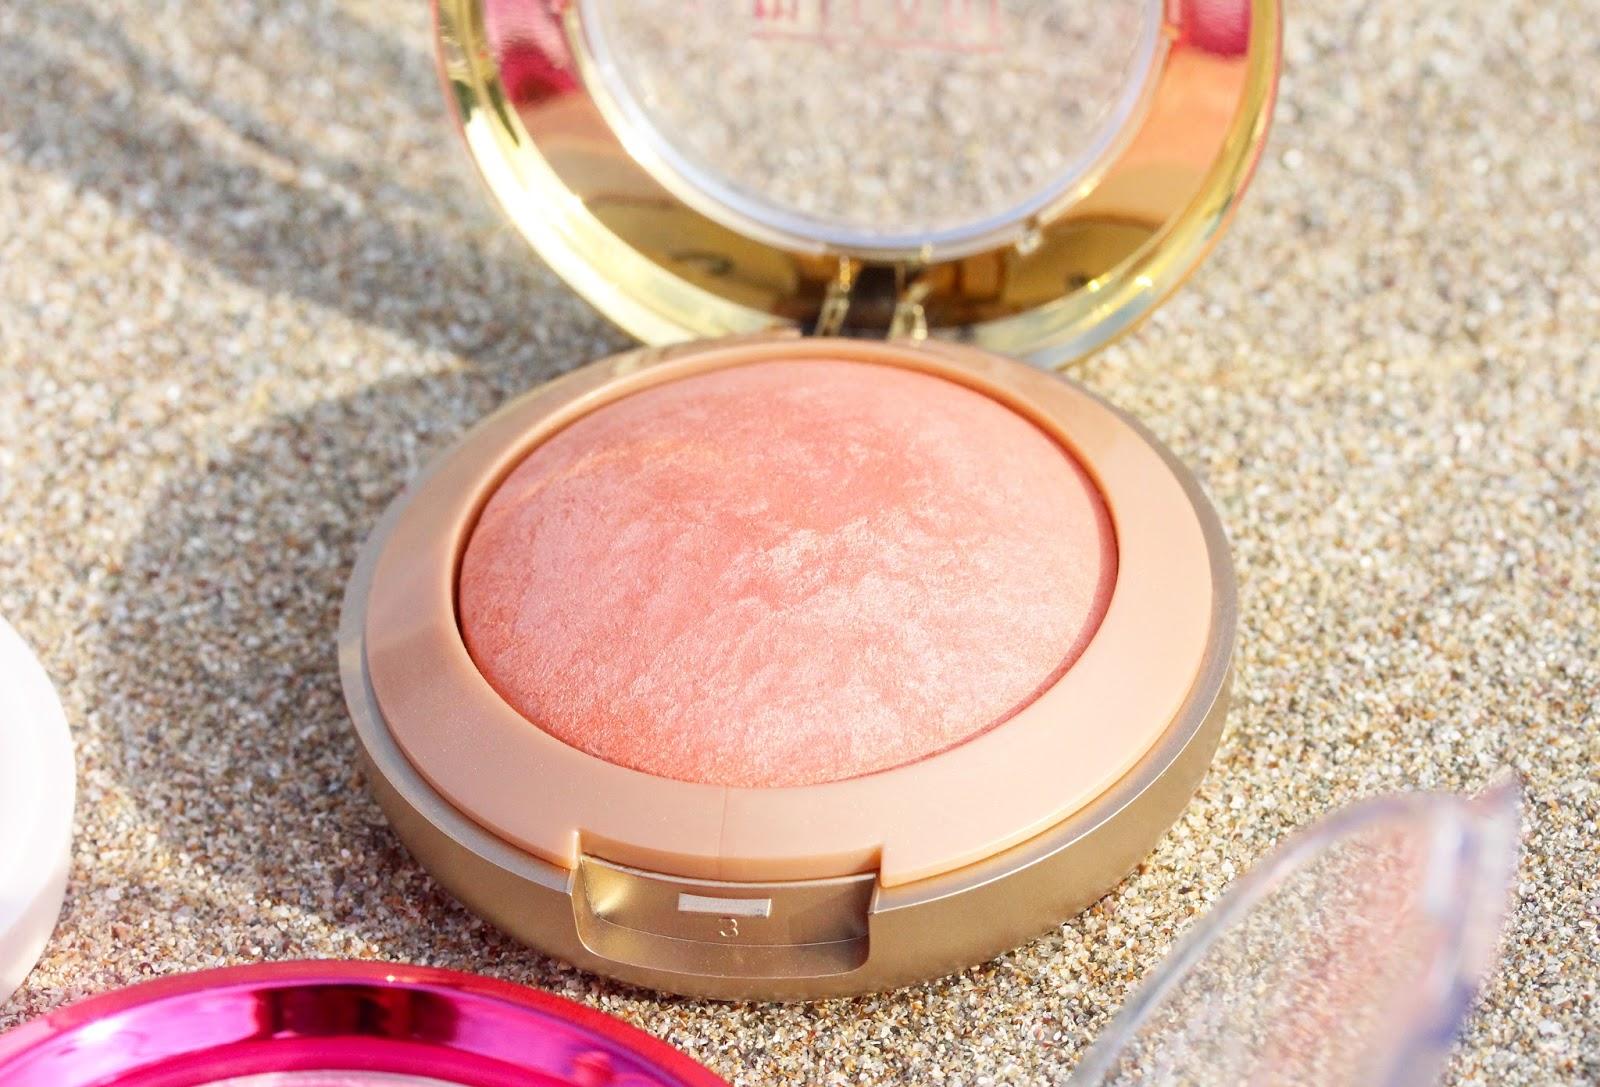 Milani Luminoso baked blush